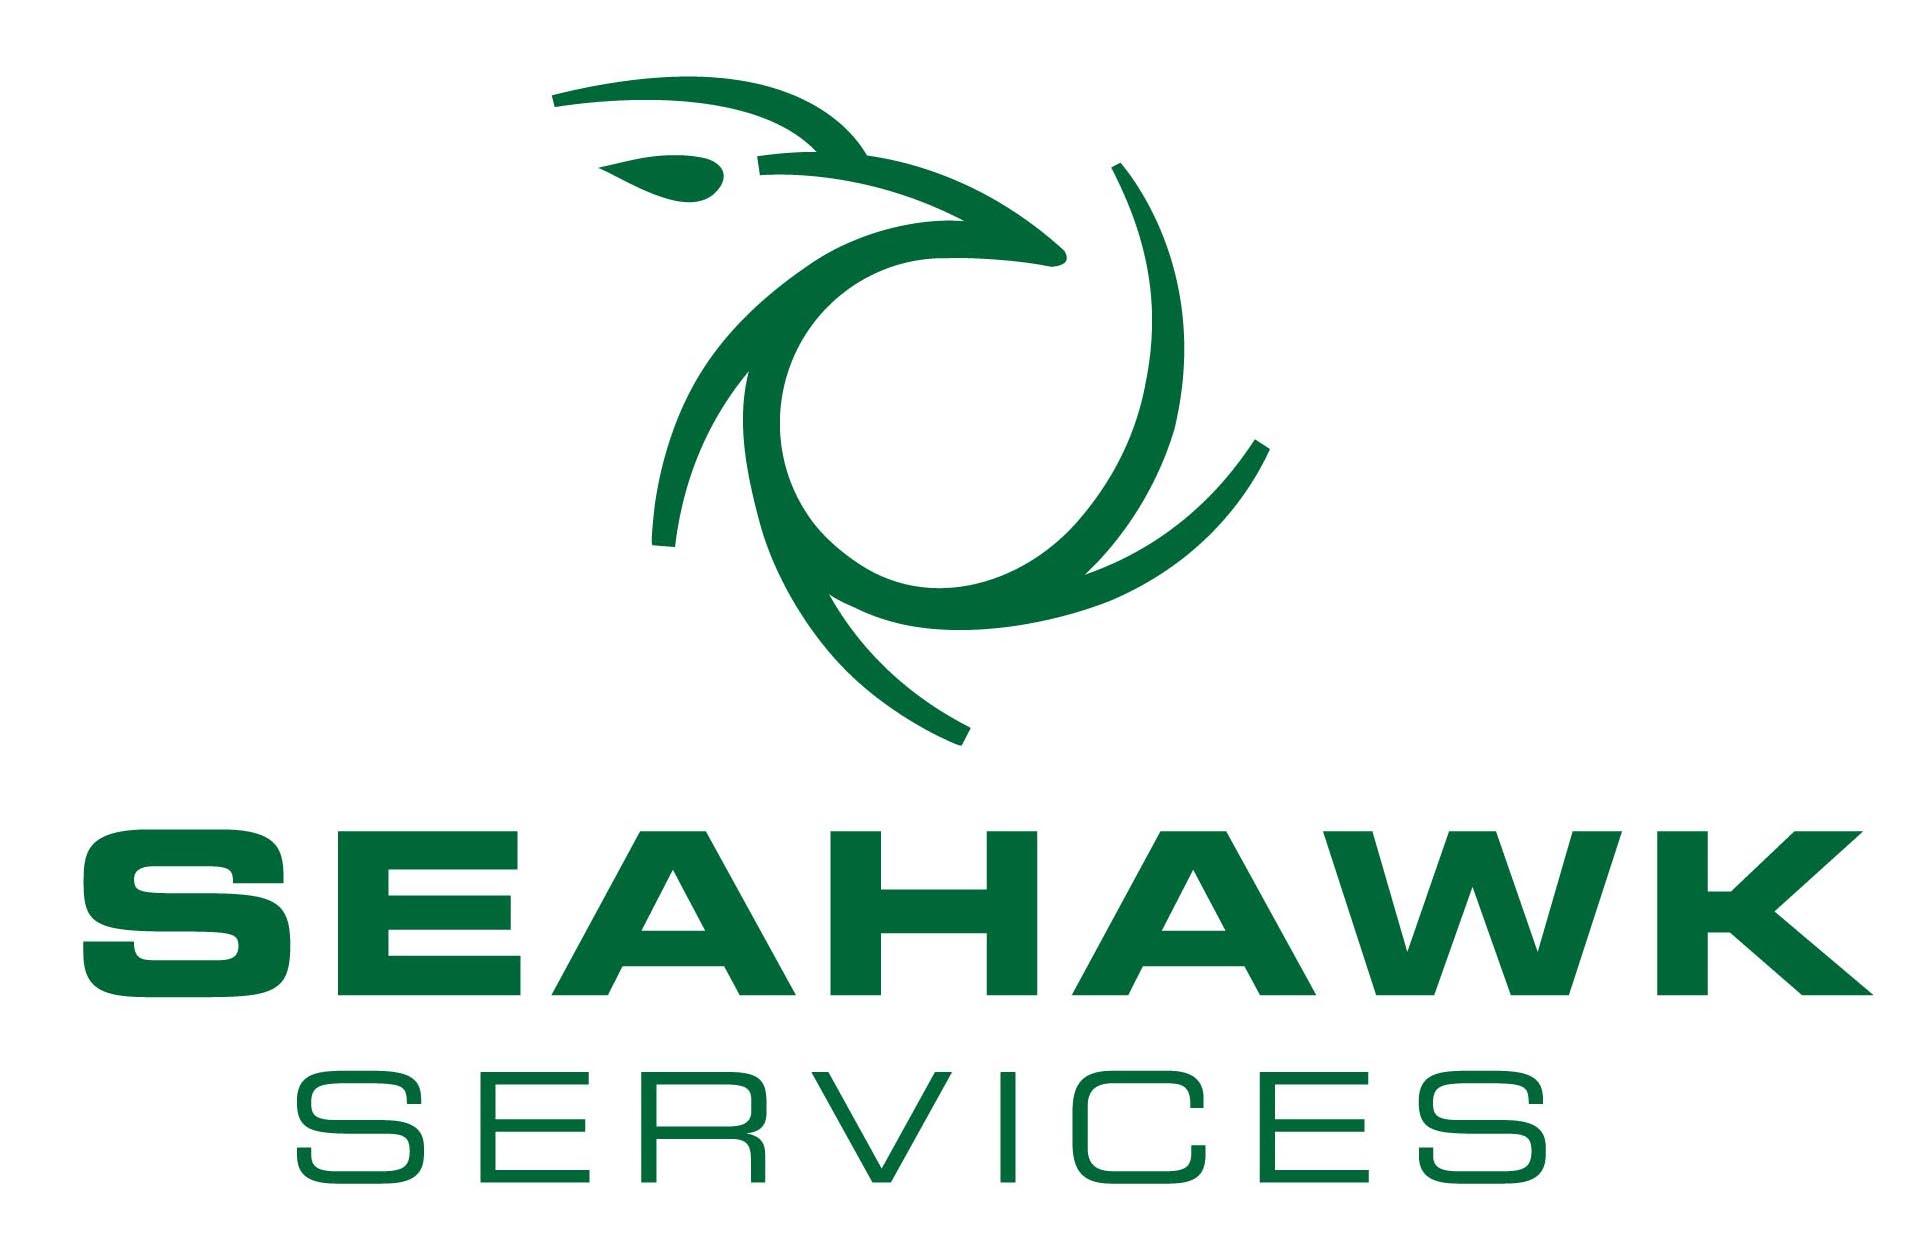 Seahawk Services